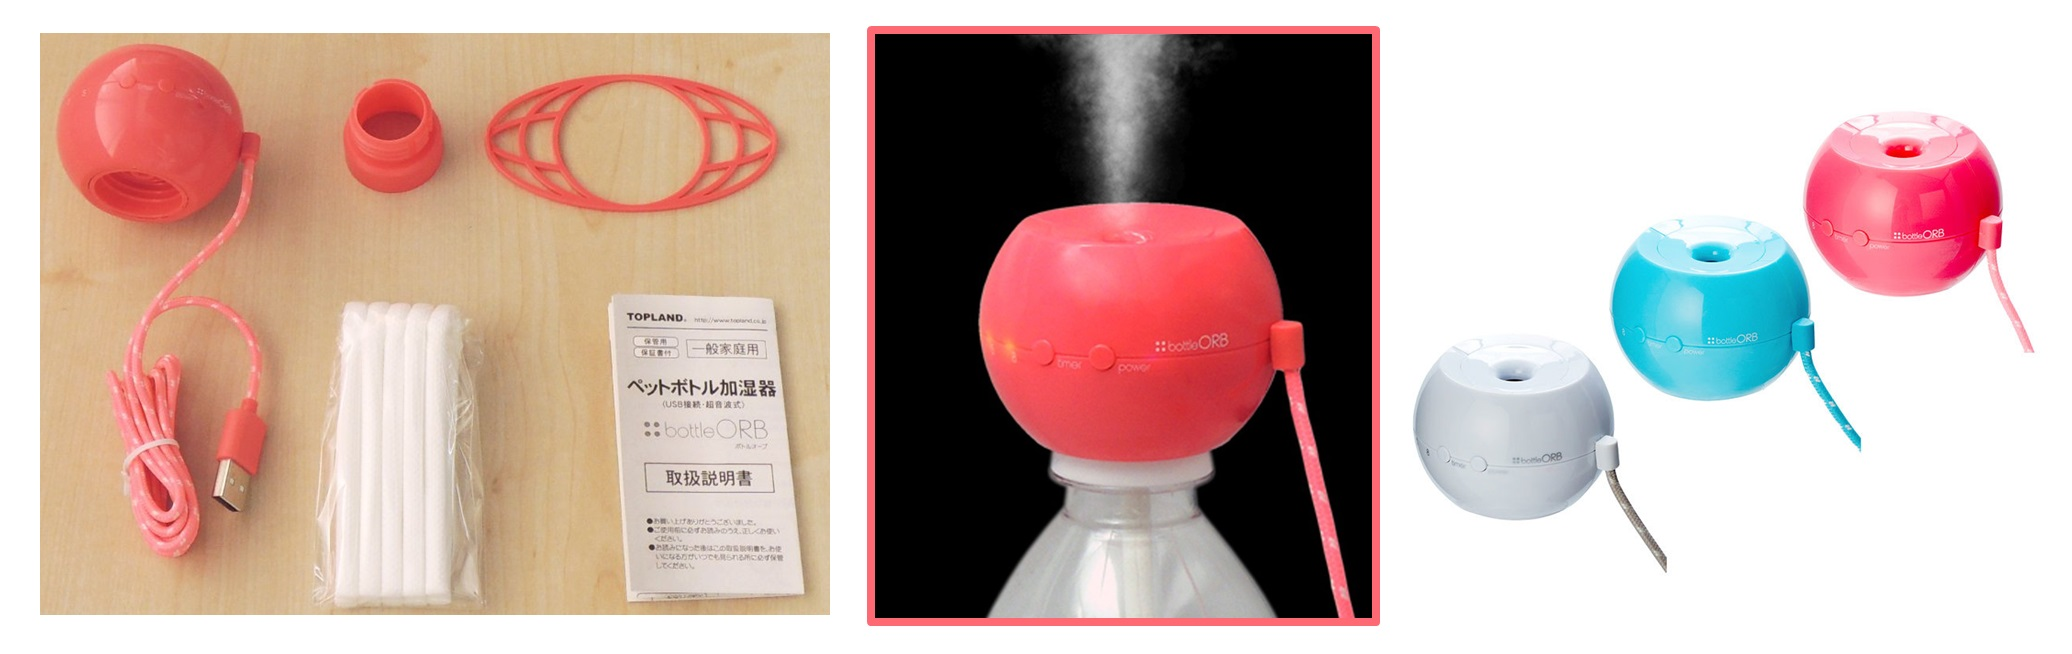 Bottle-top Humidifier Orb